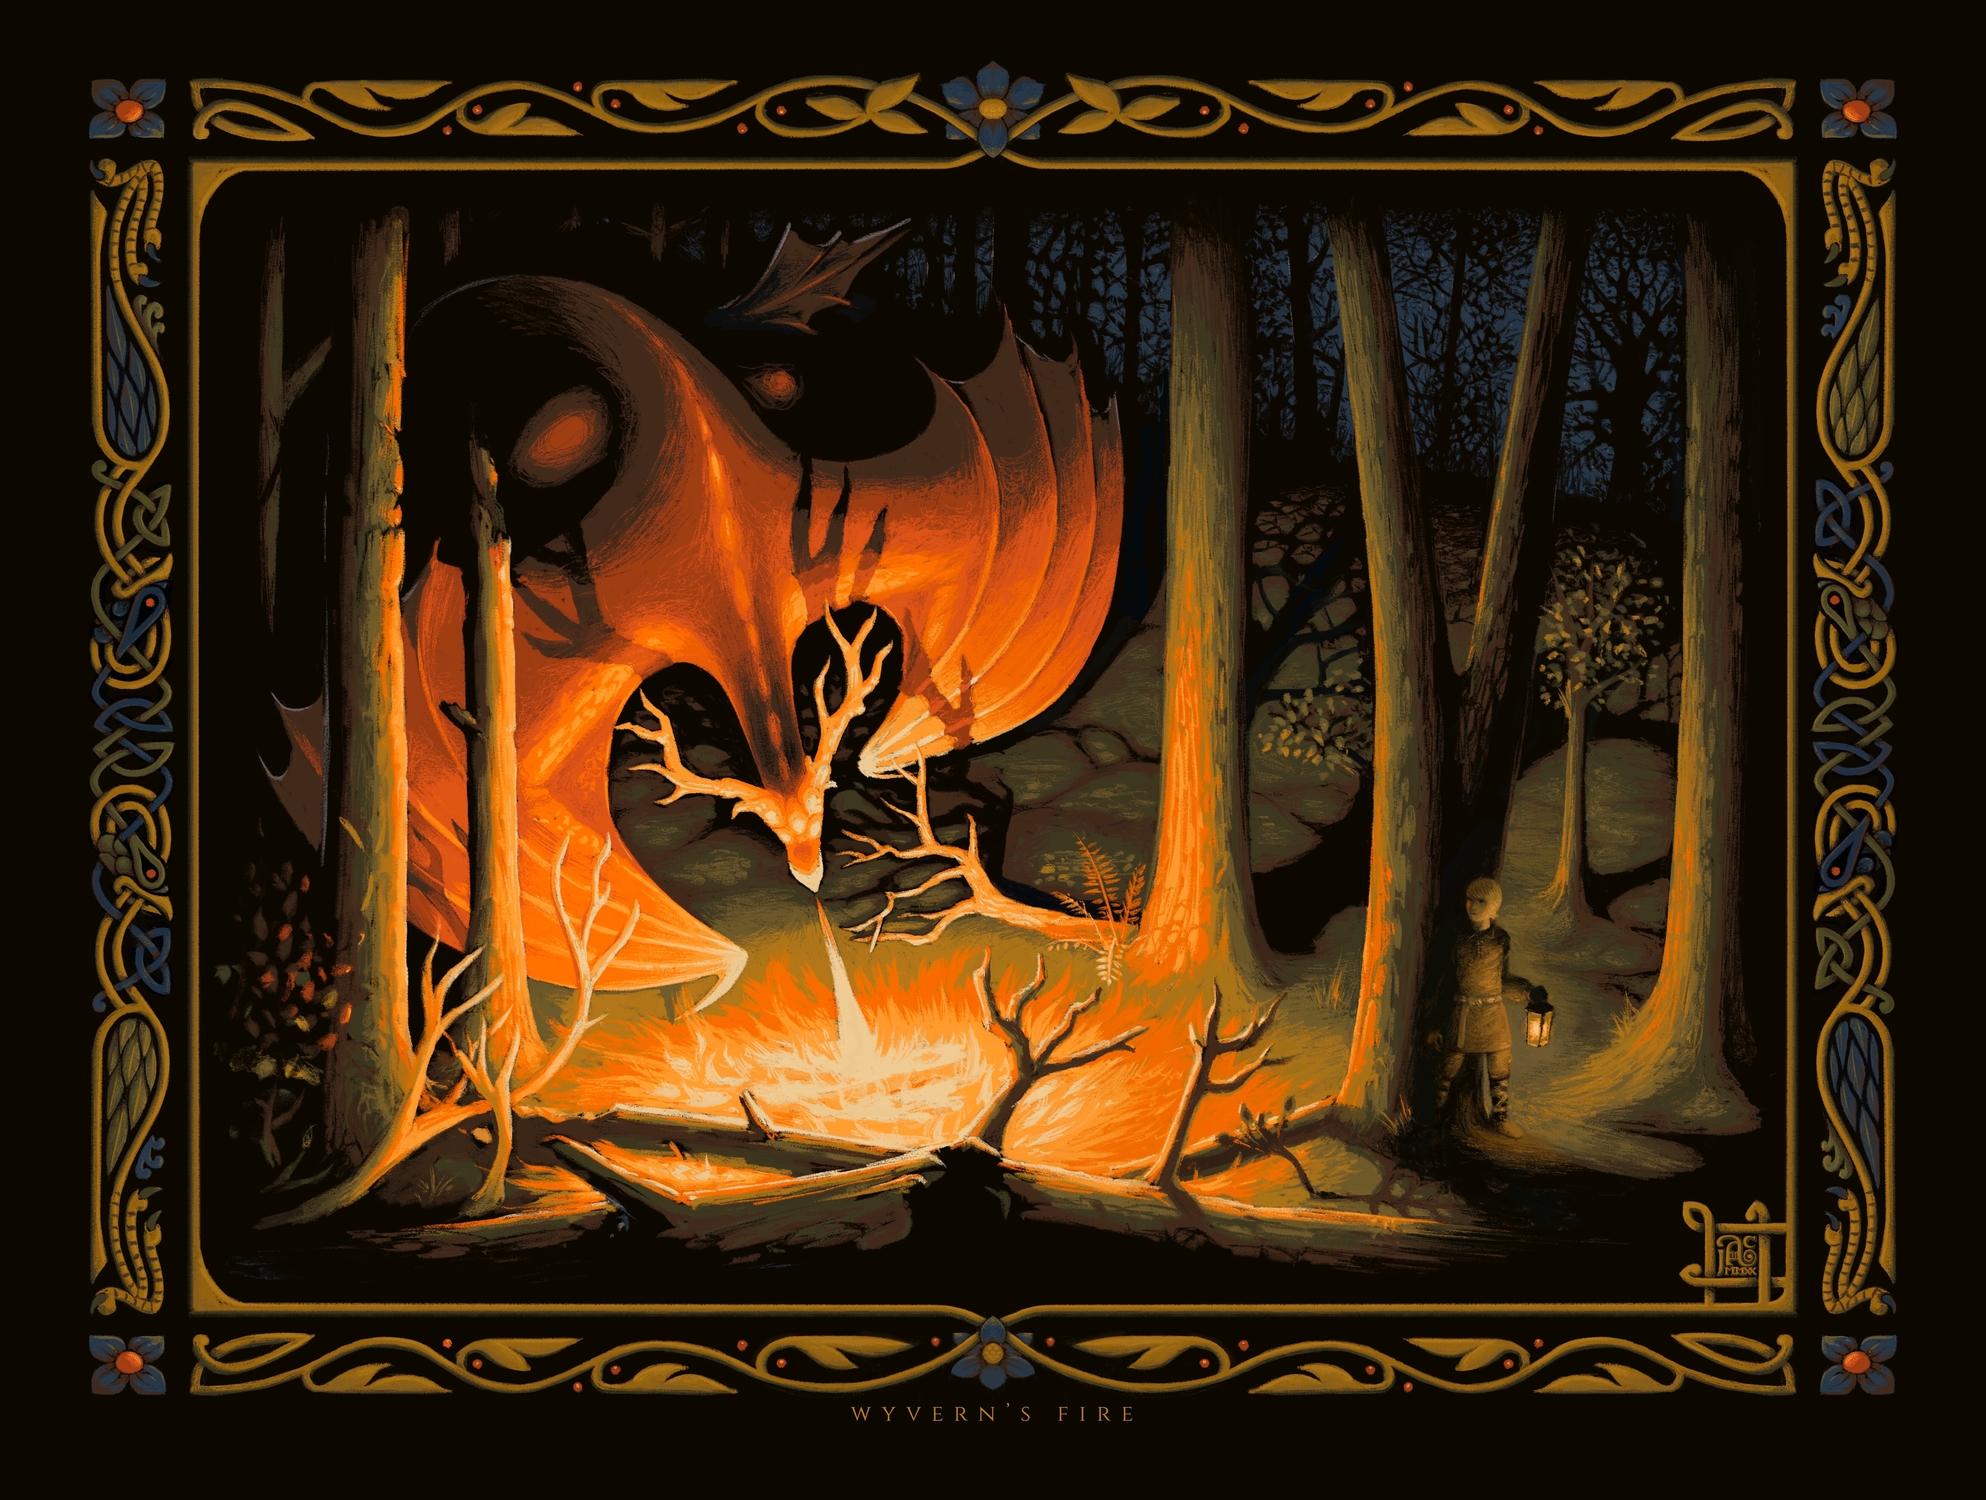 Wyvern's Fire Artwork by James Adam Cartwright